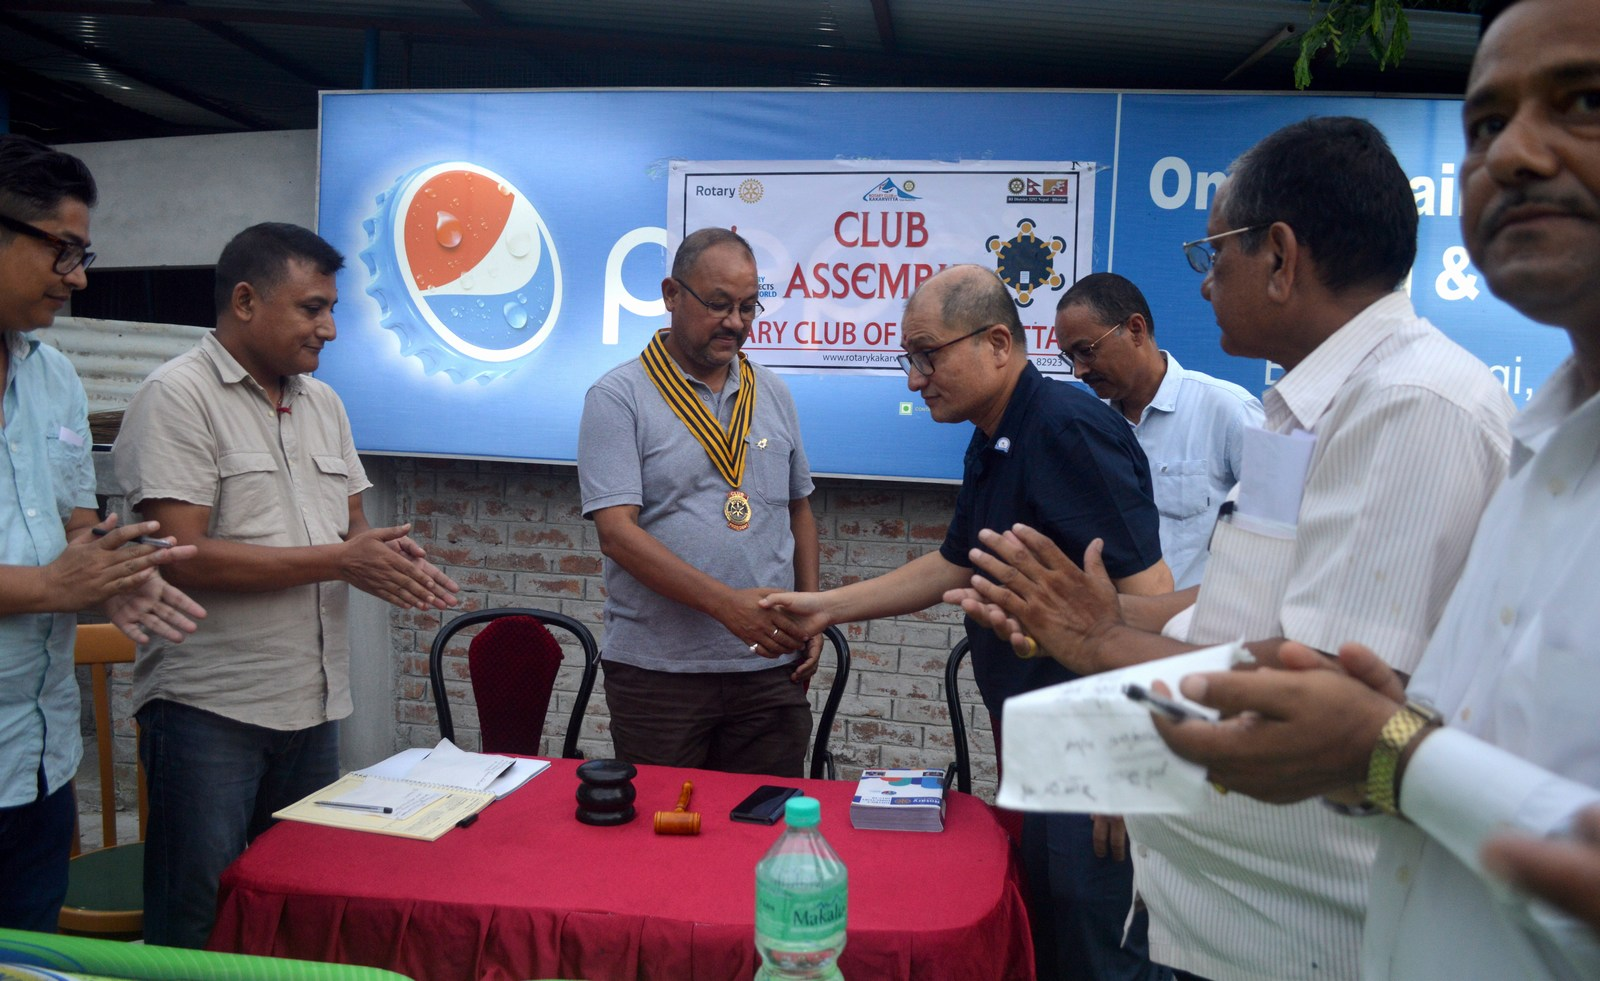 1st-Club-Assembly-2018-19-Rotary-Club-of-Kakarvitta-6